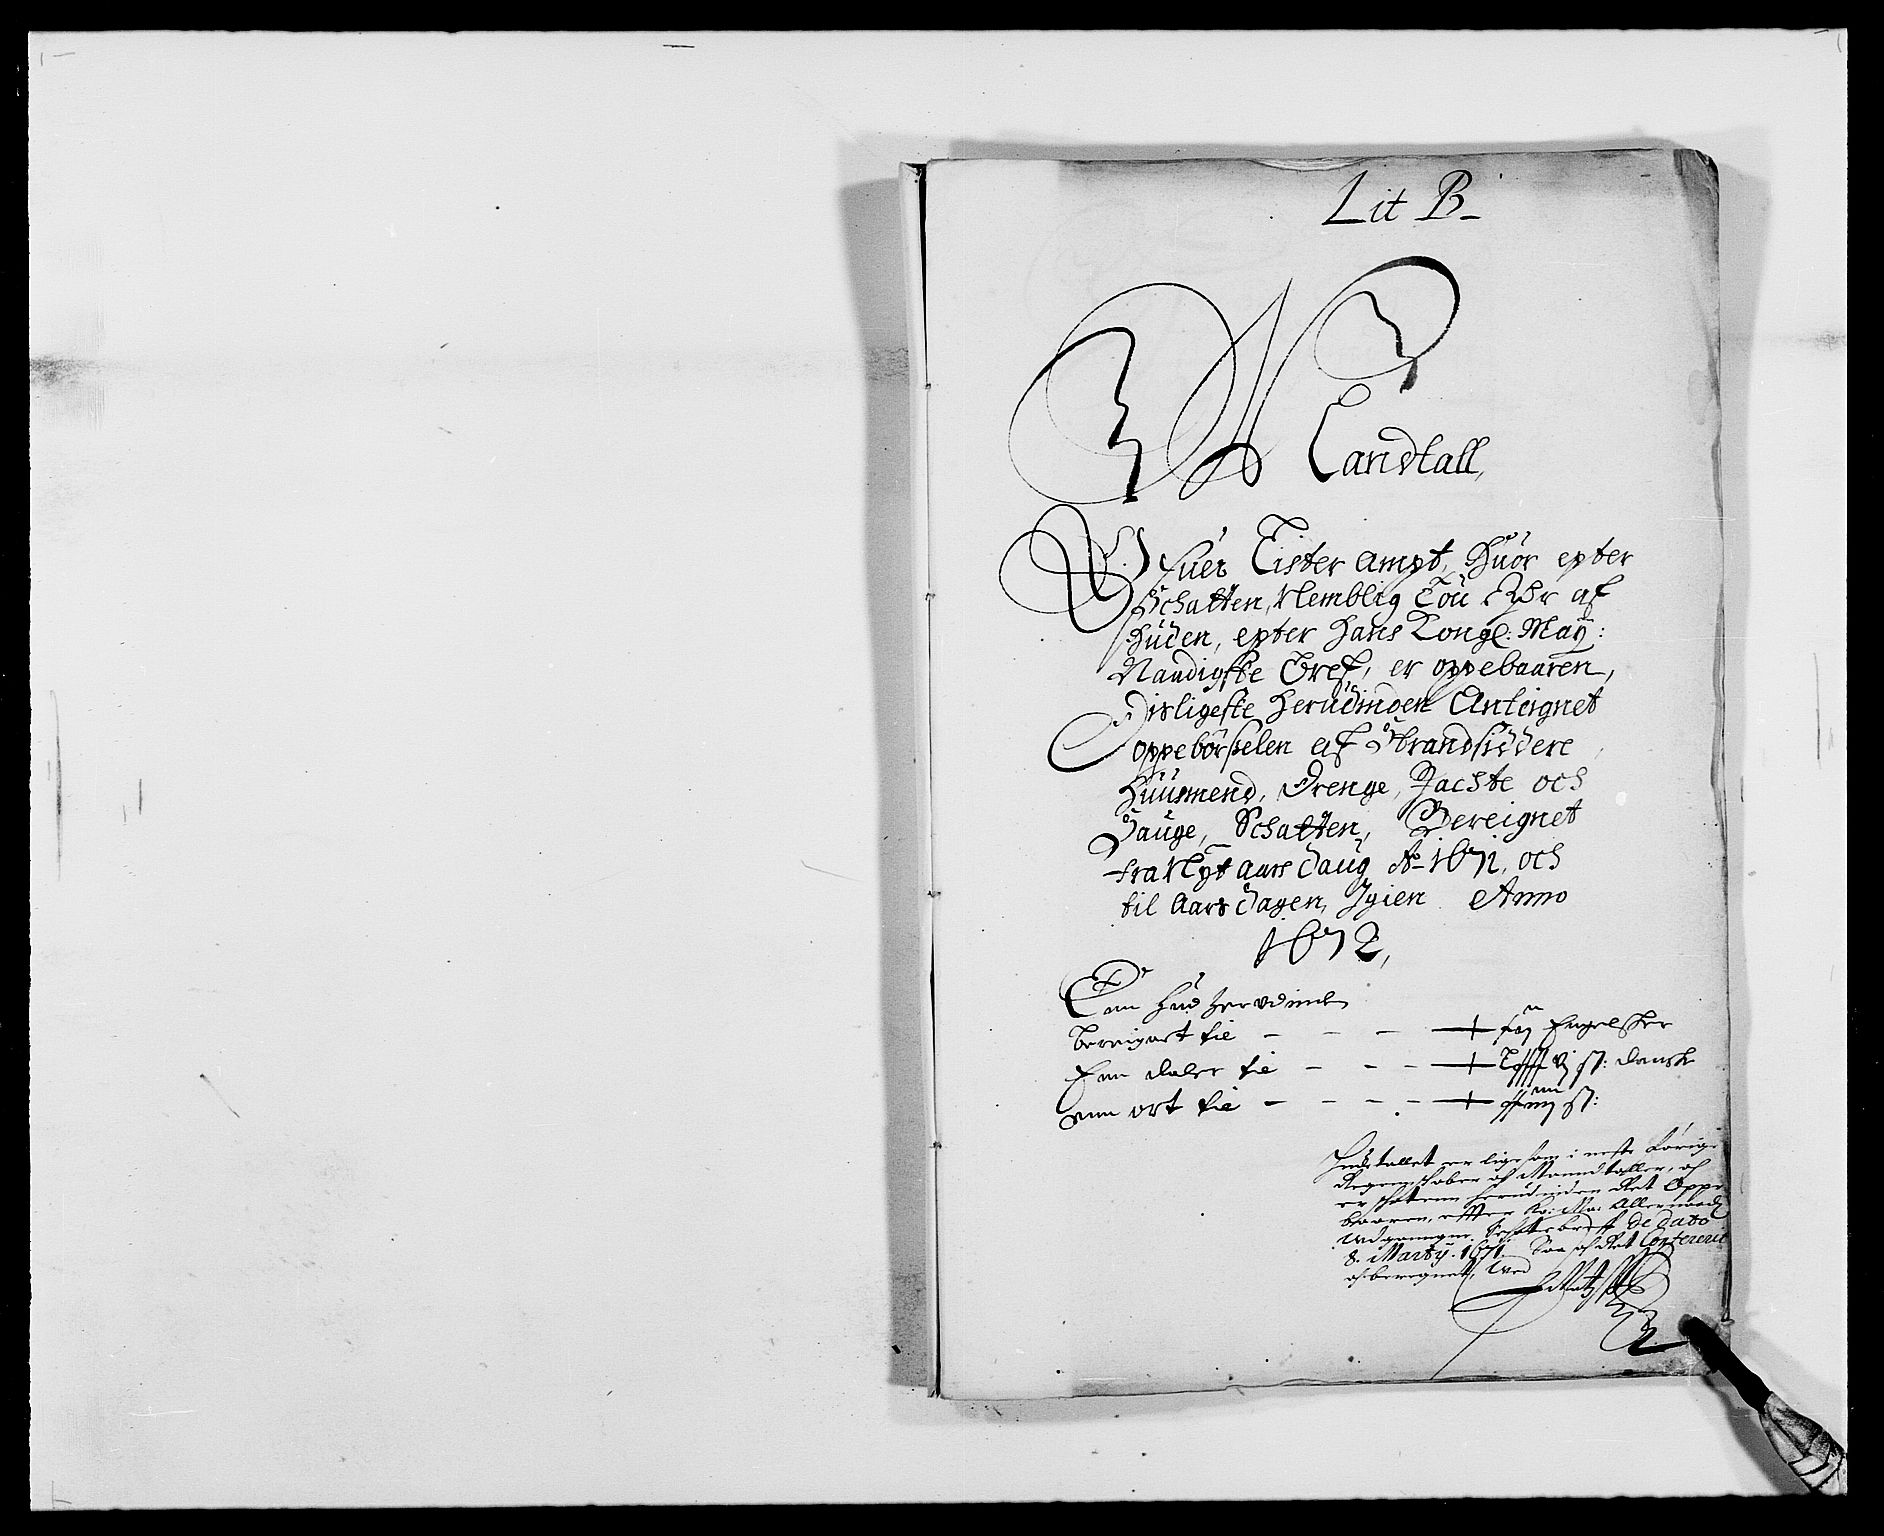 RA, Rentekammeret inntil 1814, Reviderte regnskaper, Fogderegnskap, R41/L2525: Fogderegnskap Lista, 1669-1671, s. 247